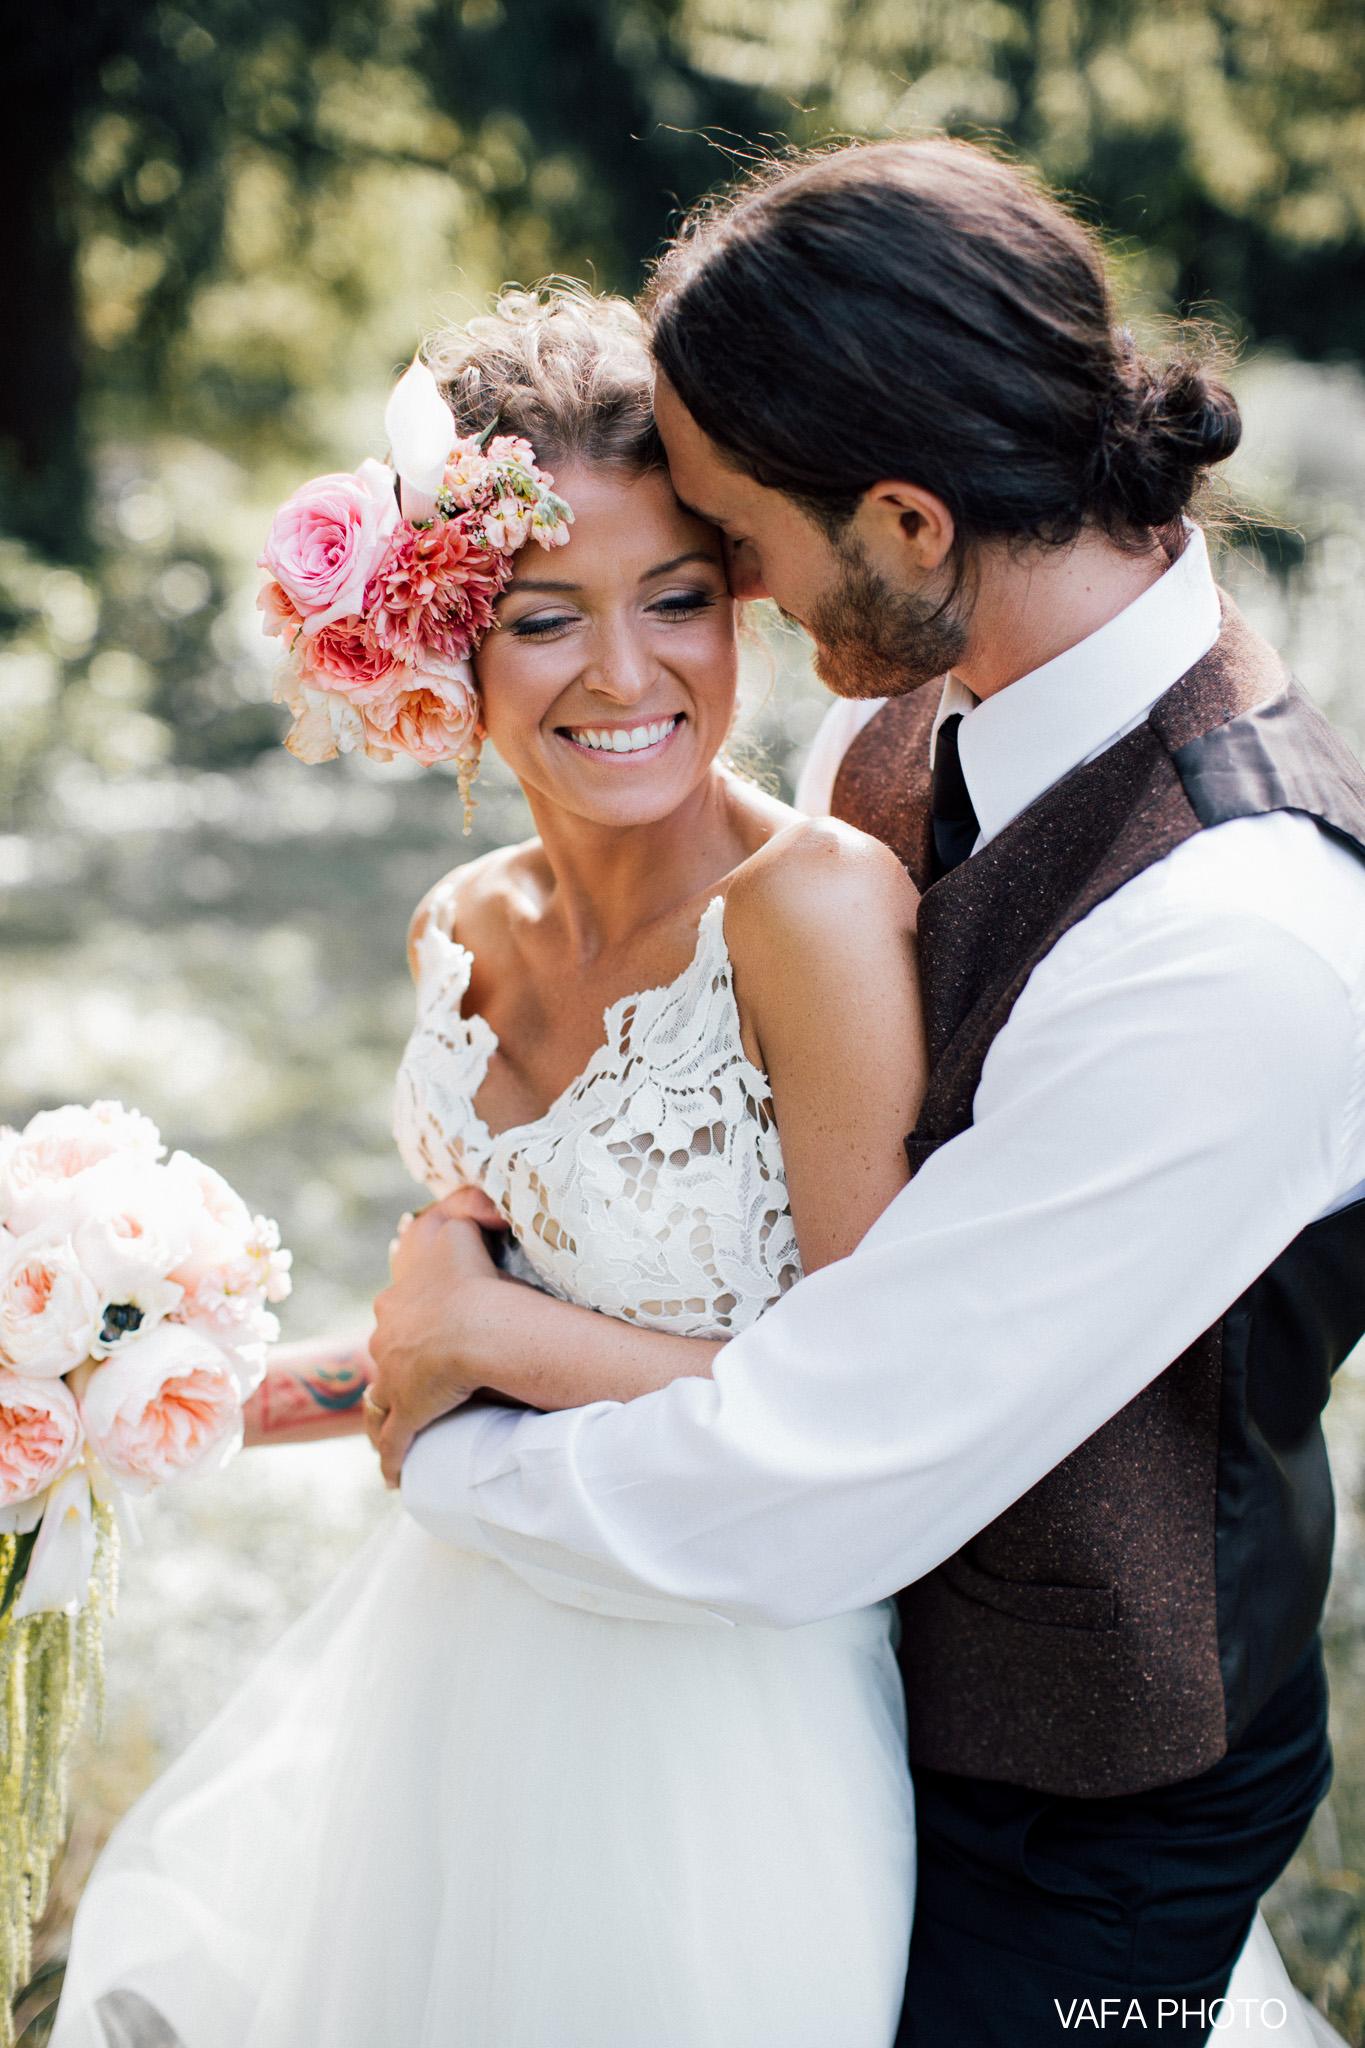 The-Felt-Estate-Wedding-Kailie-David-Vafa-Photo-765.jpg